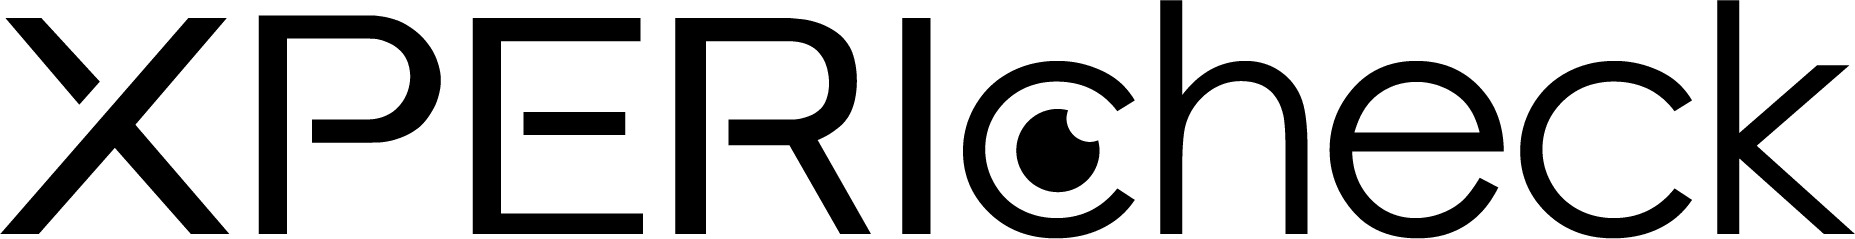 XperiCheck.com Logo